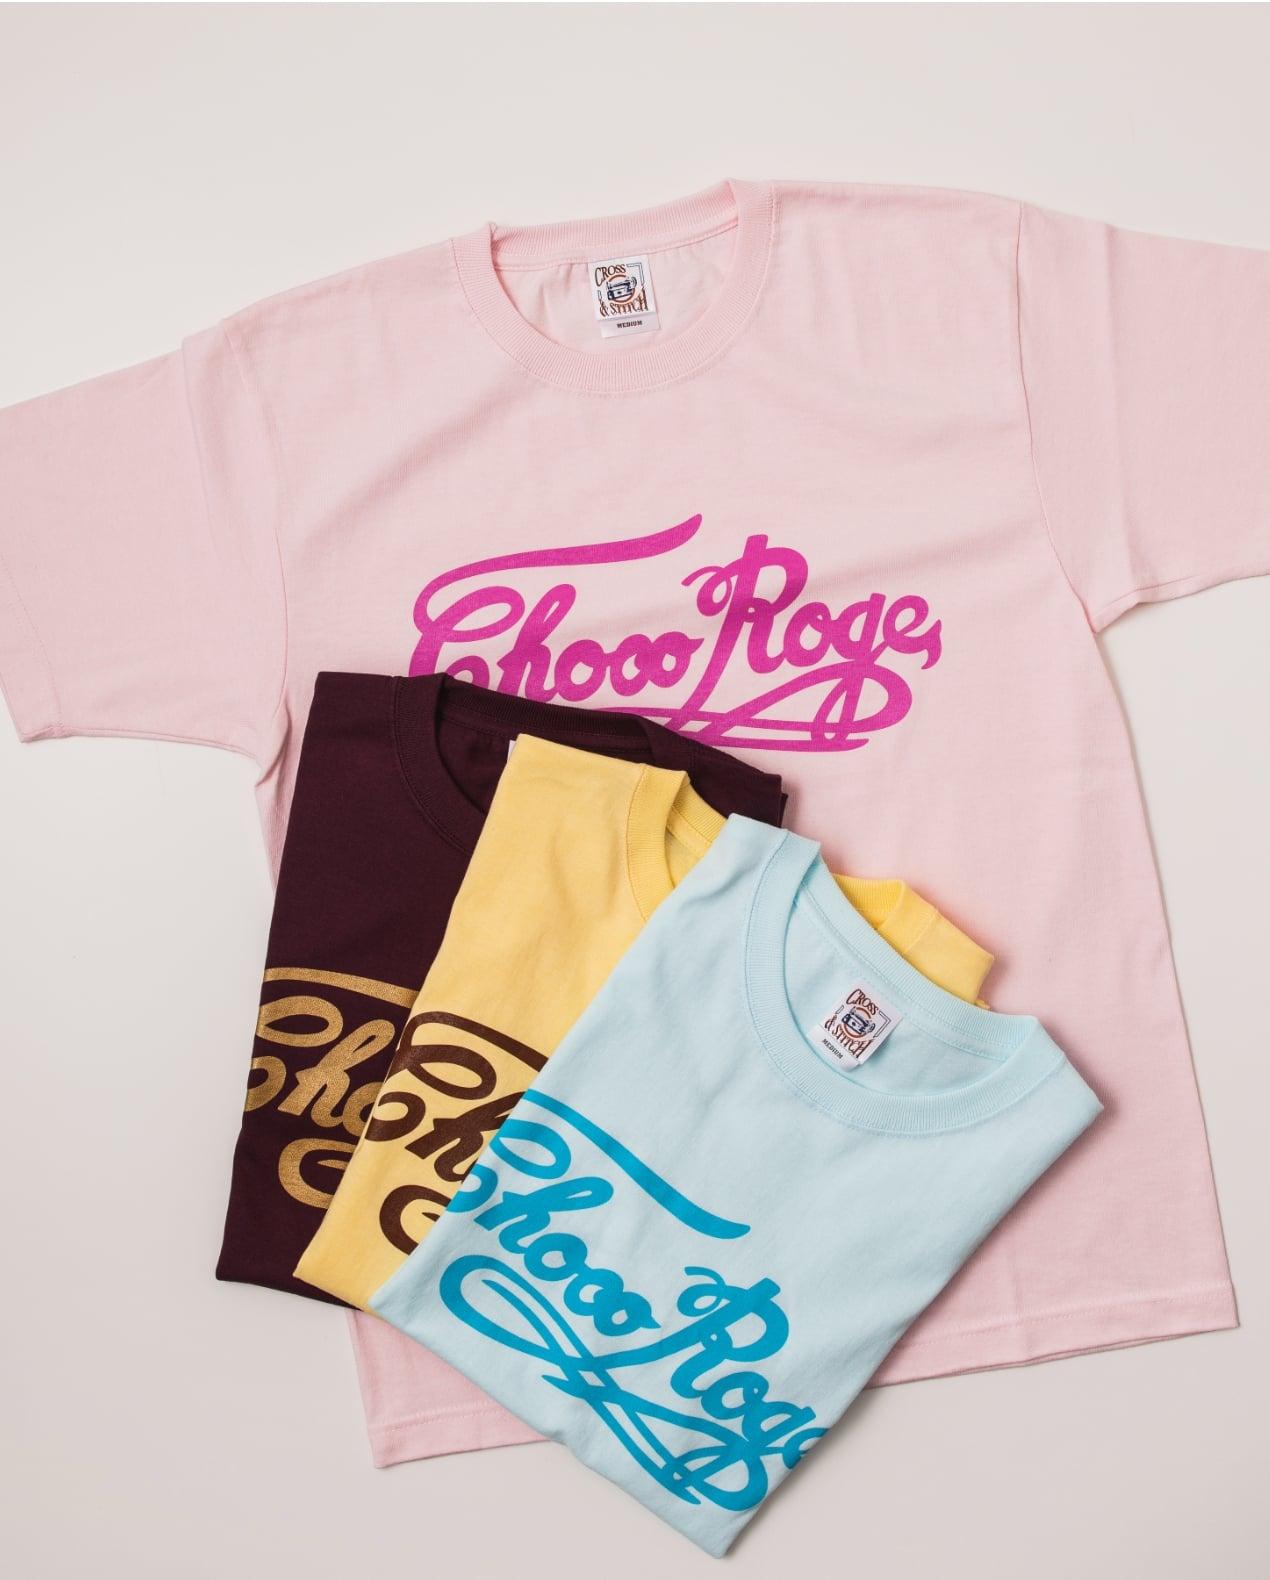 Tシャツ 大人用 ピンク サイズL